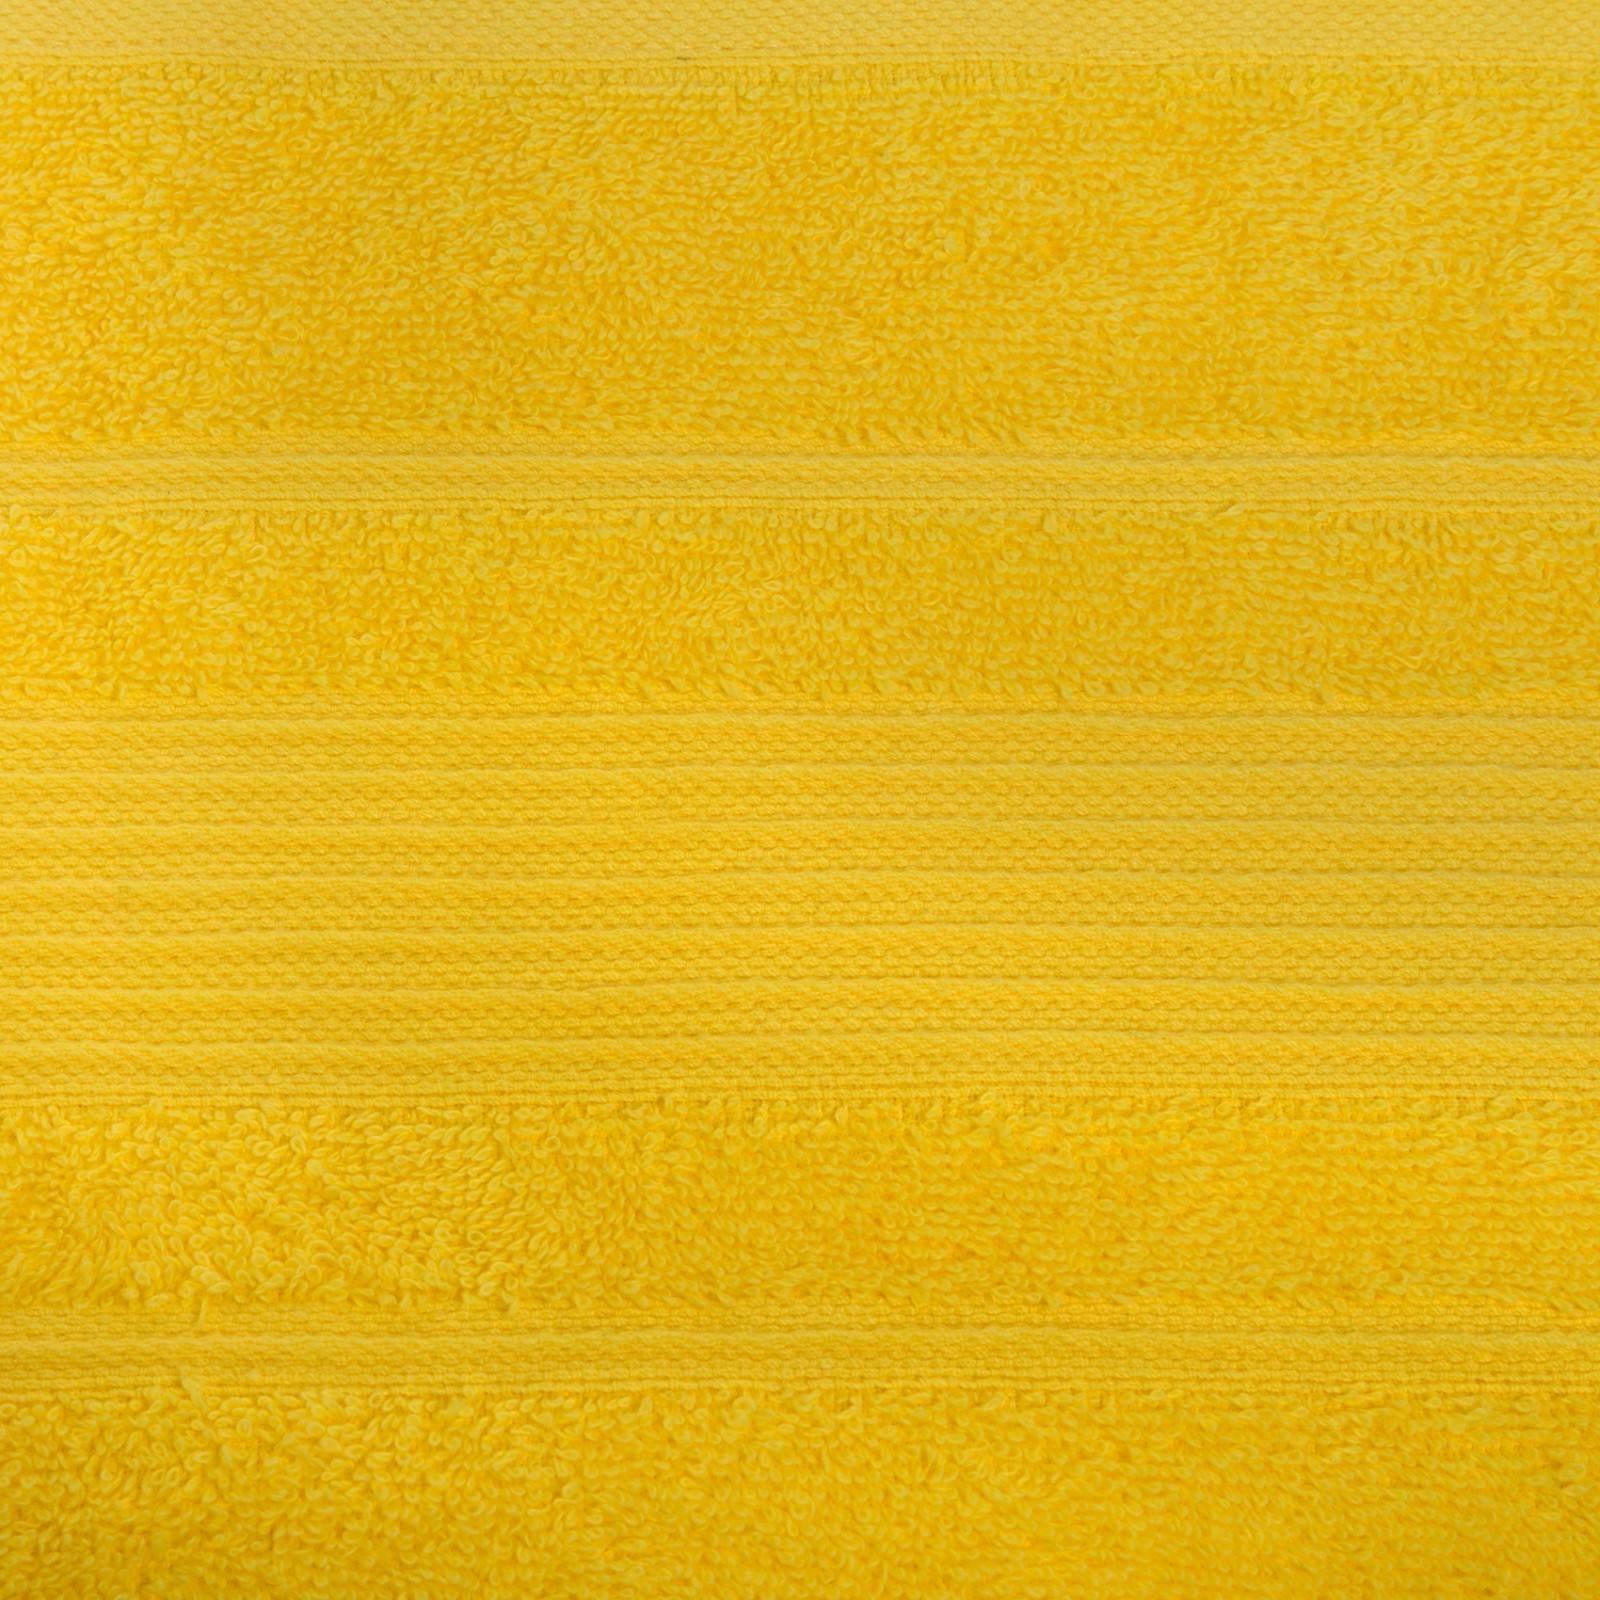 NEW SUPER LUXURY TURKISH 100% COTTON HAND TOWELS